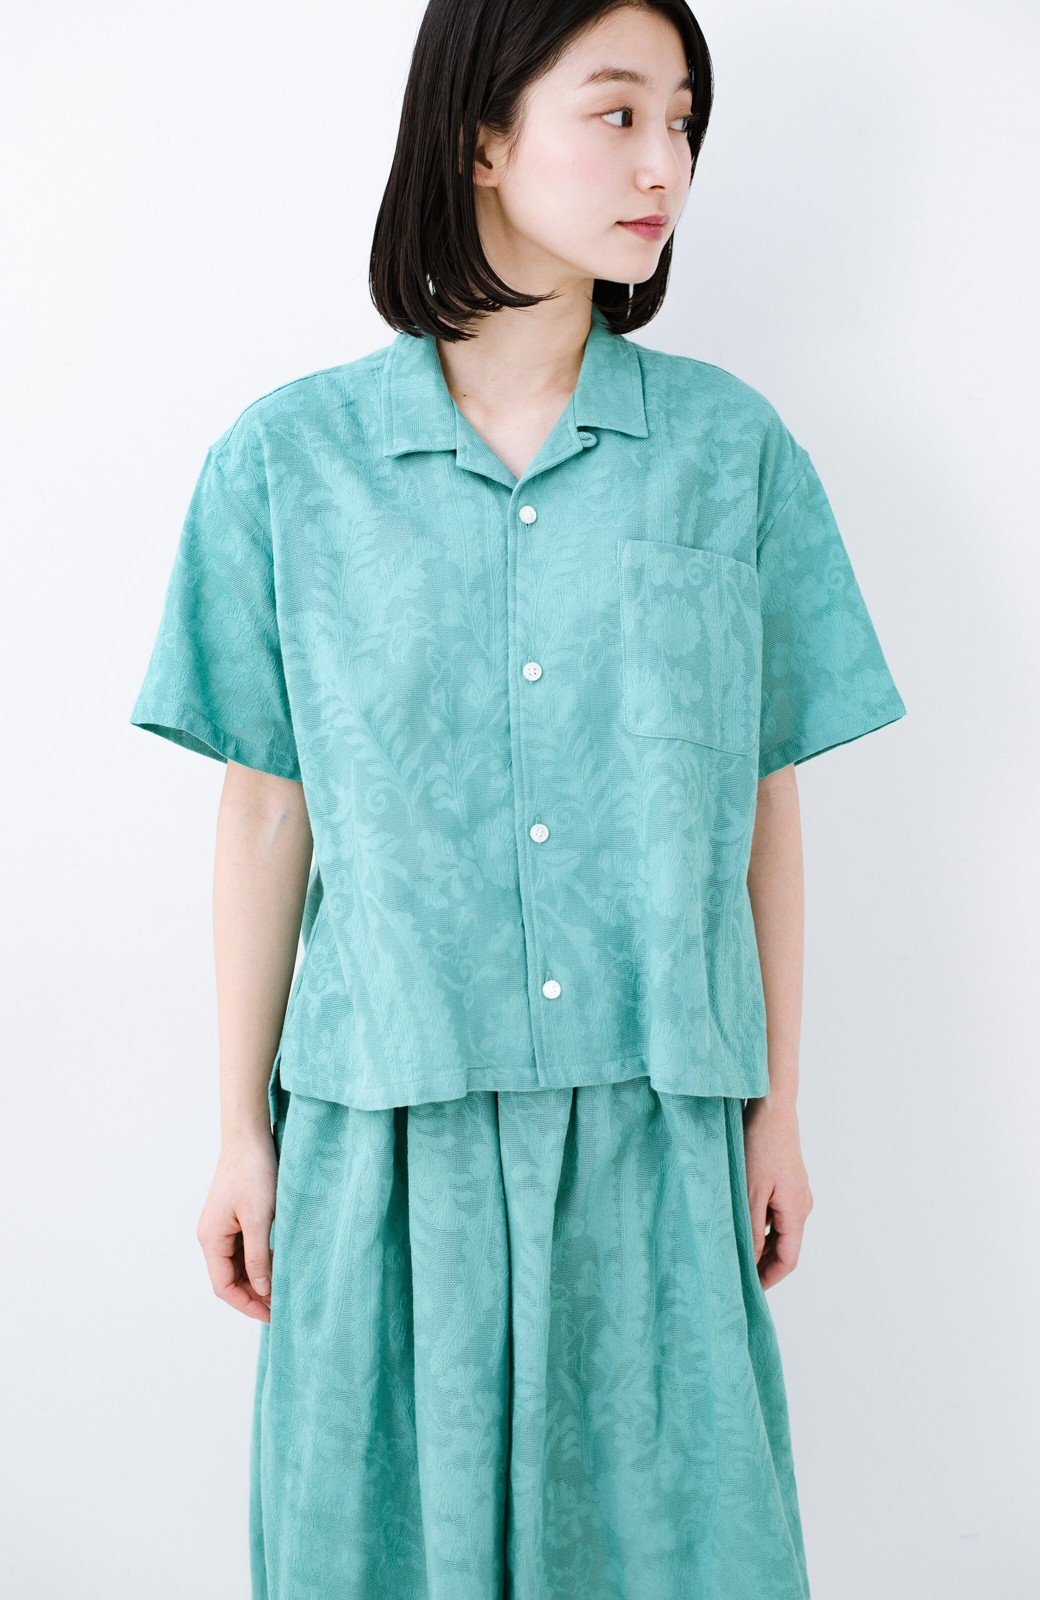 haco! 【今年も再販!】京都の浴衣屋さんと作った浴衣生地のシャツ <グリーン>の商品写真24